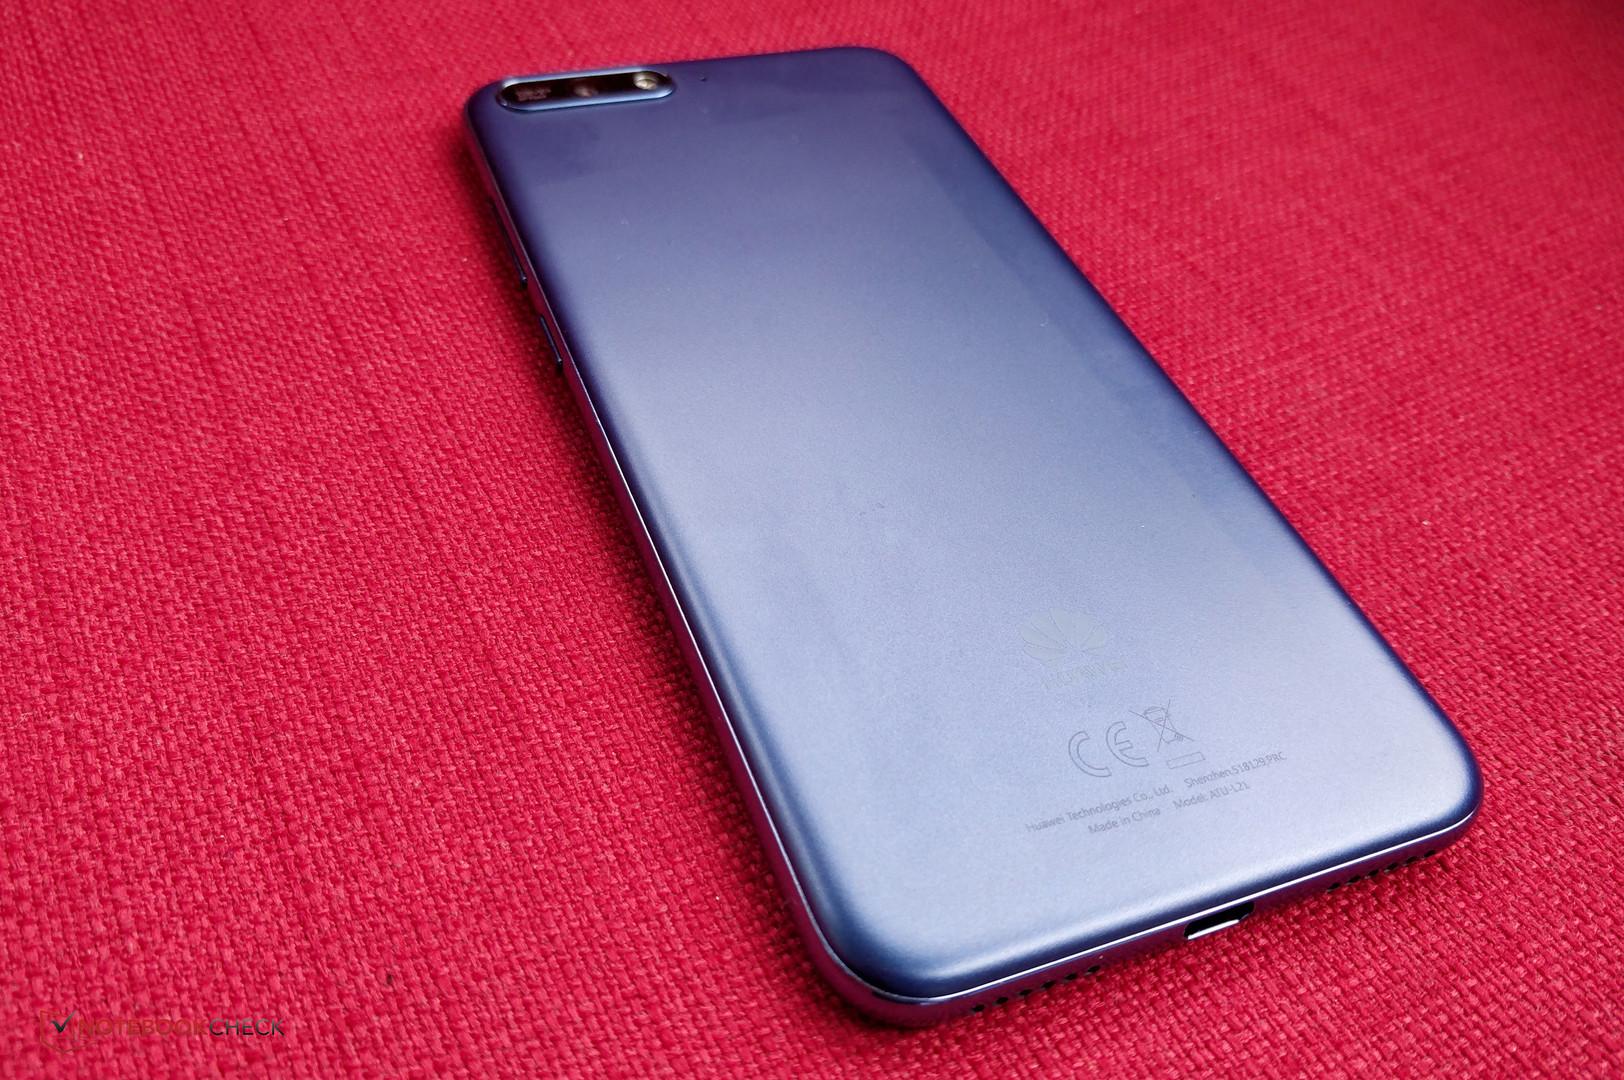 Recensione dello Smartphone Huawei Y6 2018 - Notebookcheck it